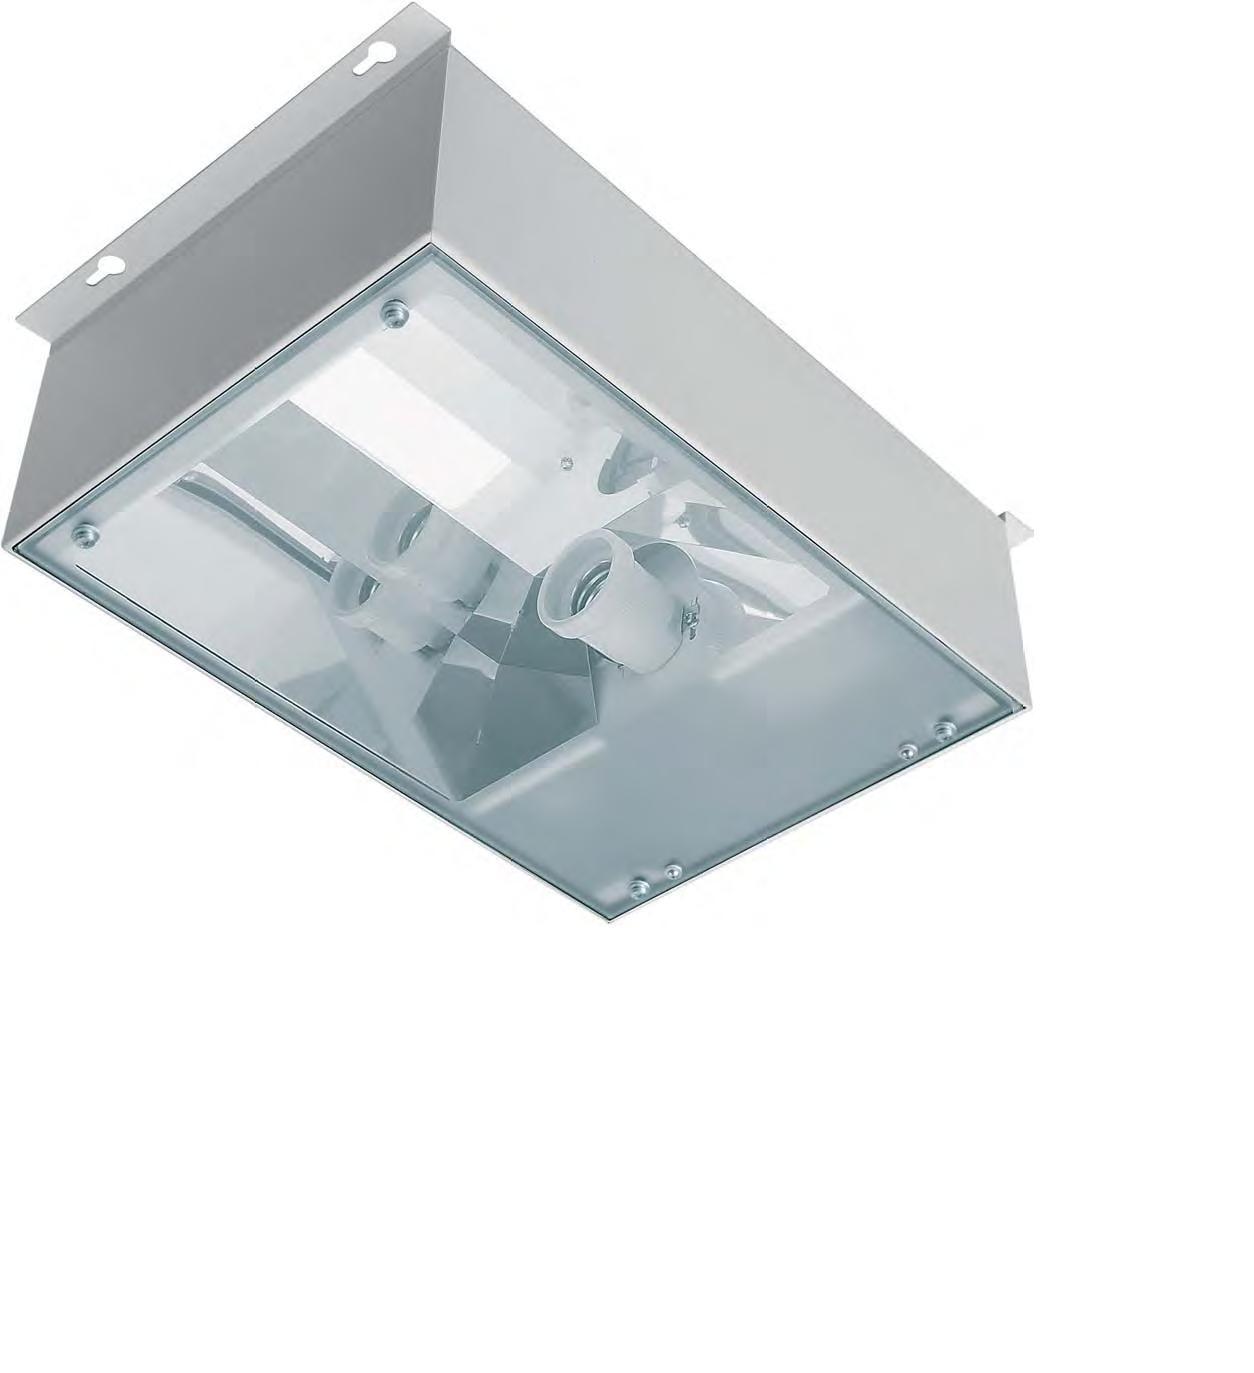 SBOX AB 1x400W, HS/HI, VVG, E40, IP65, RAL9003